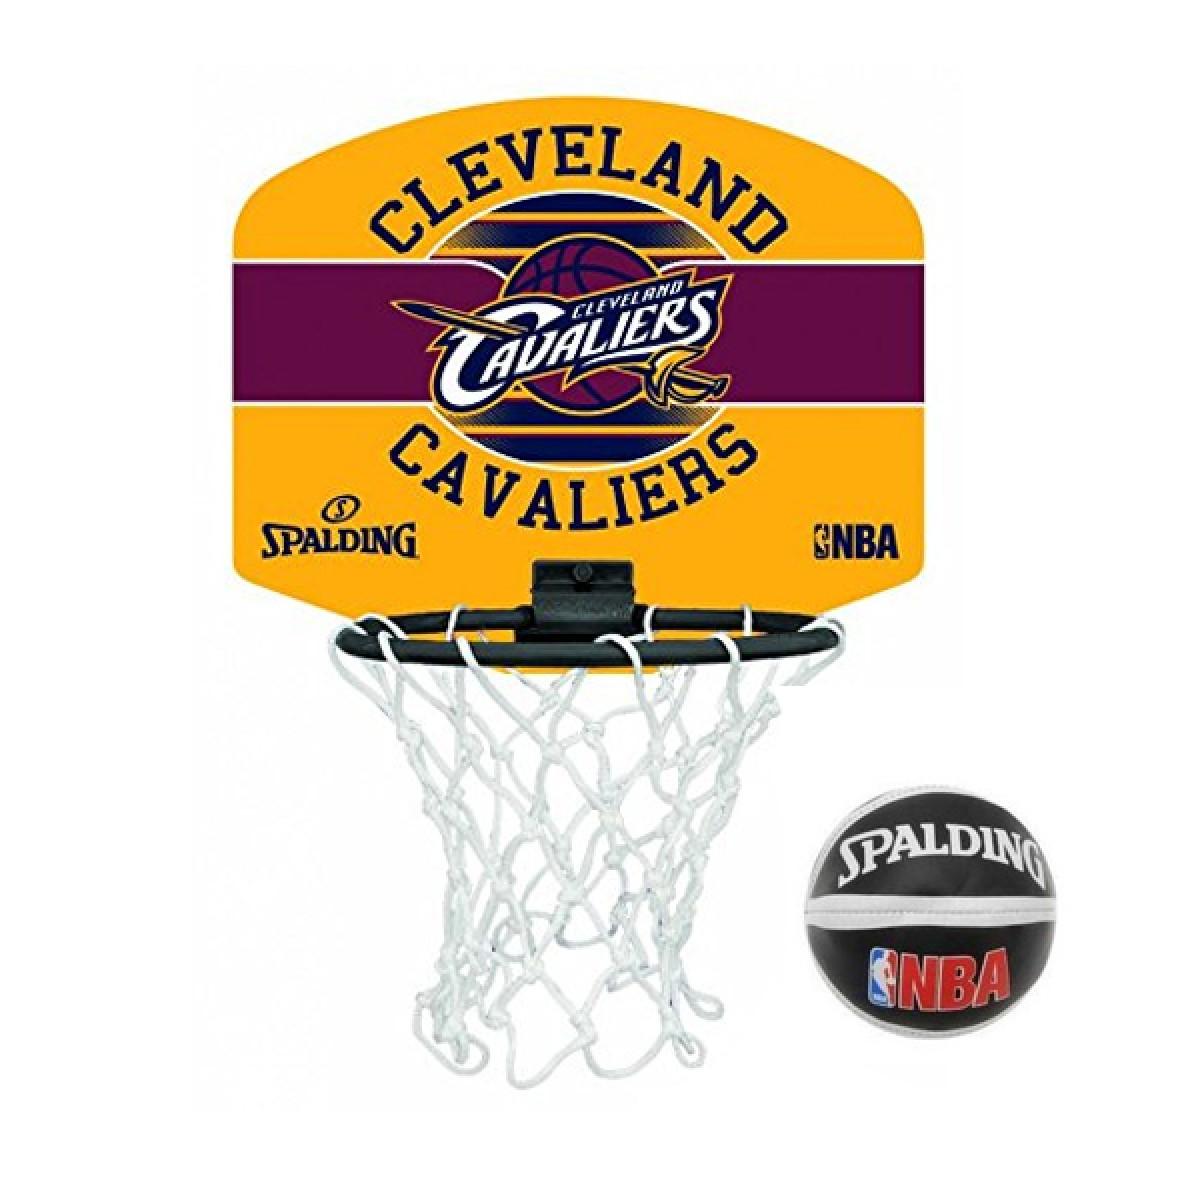 Spalding NBA Miniboards Cleveland Cavaliers